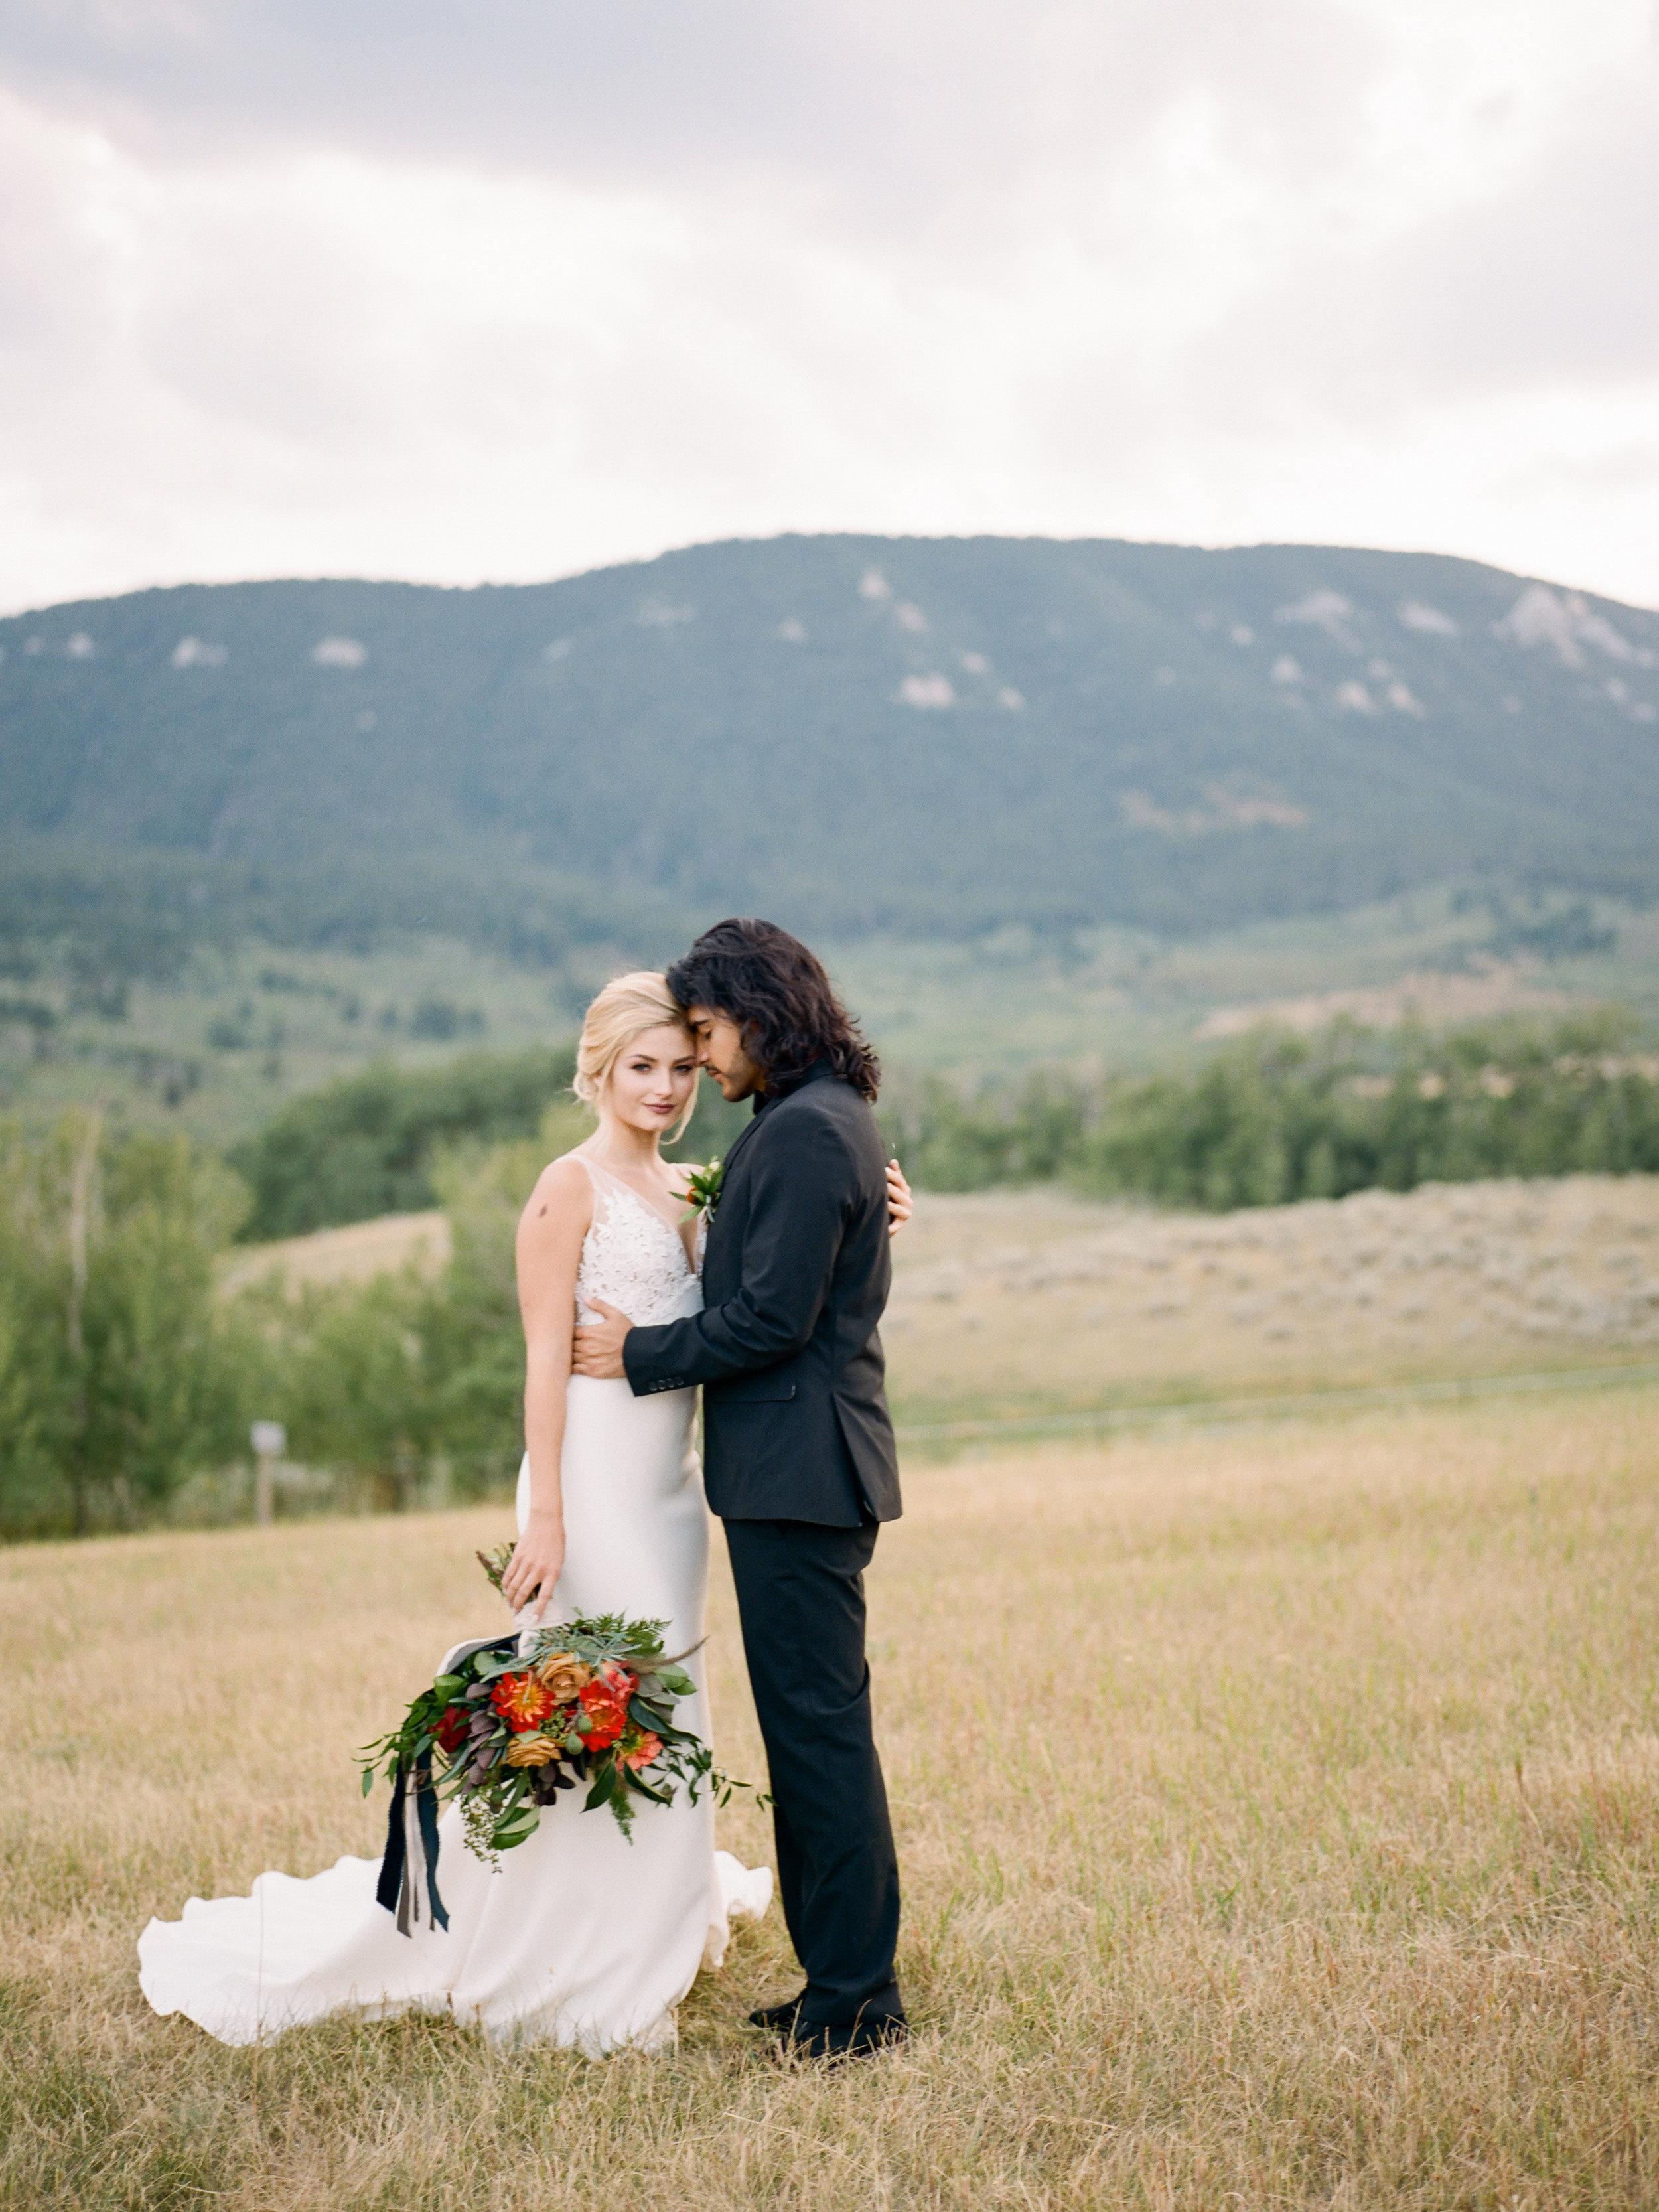 Bozeman-Big Sky-Montana-wedding-engagement-family-photographer-0163.jpg